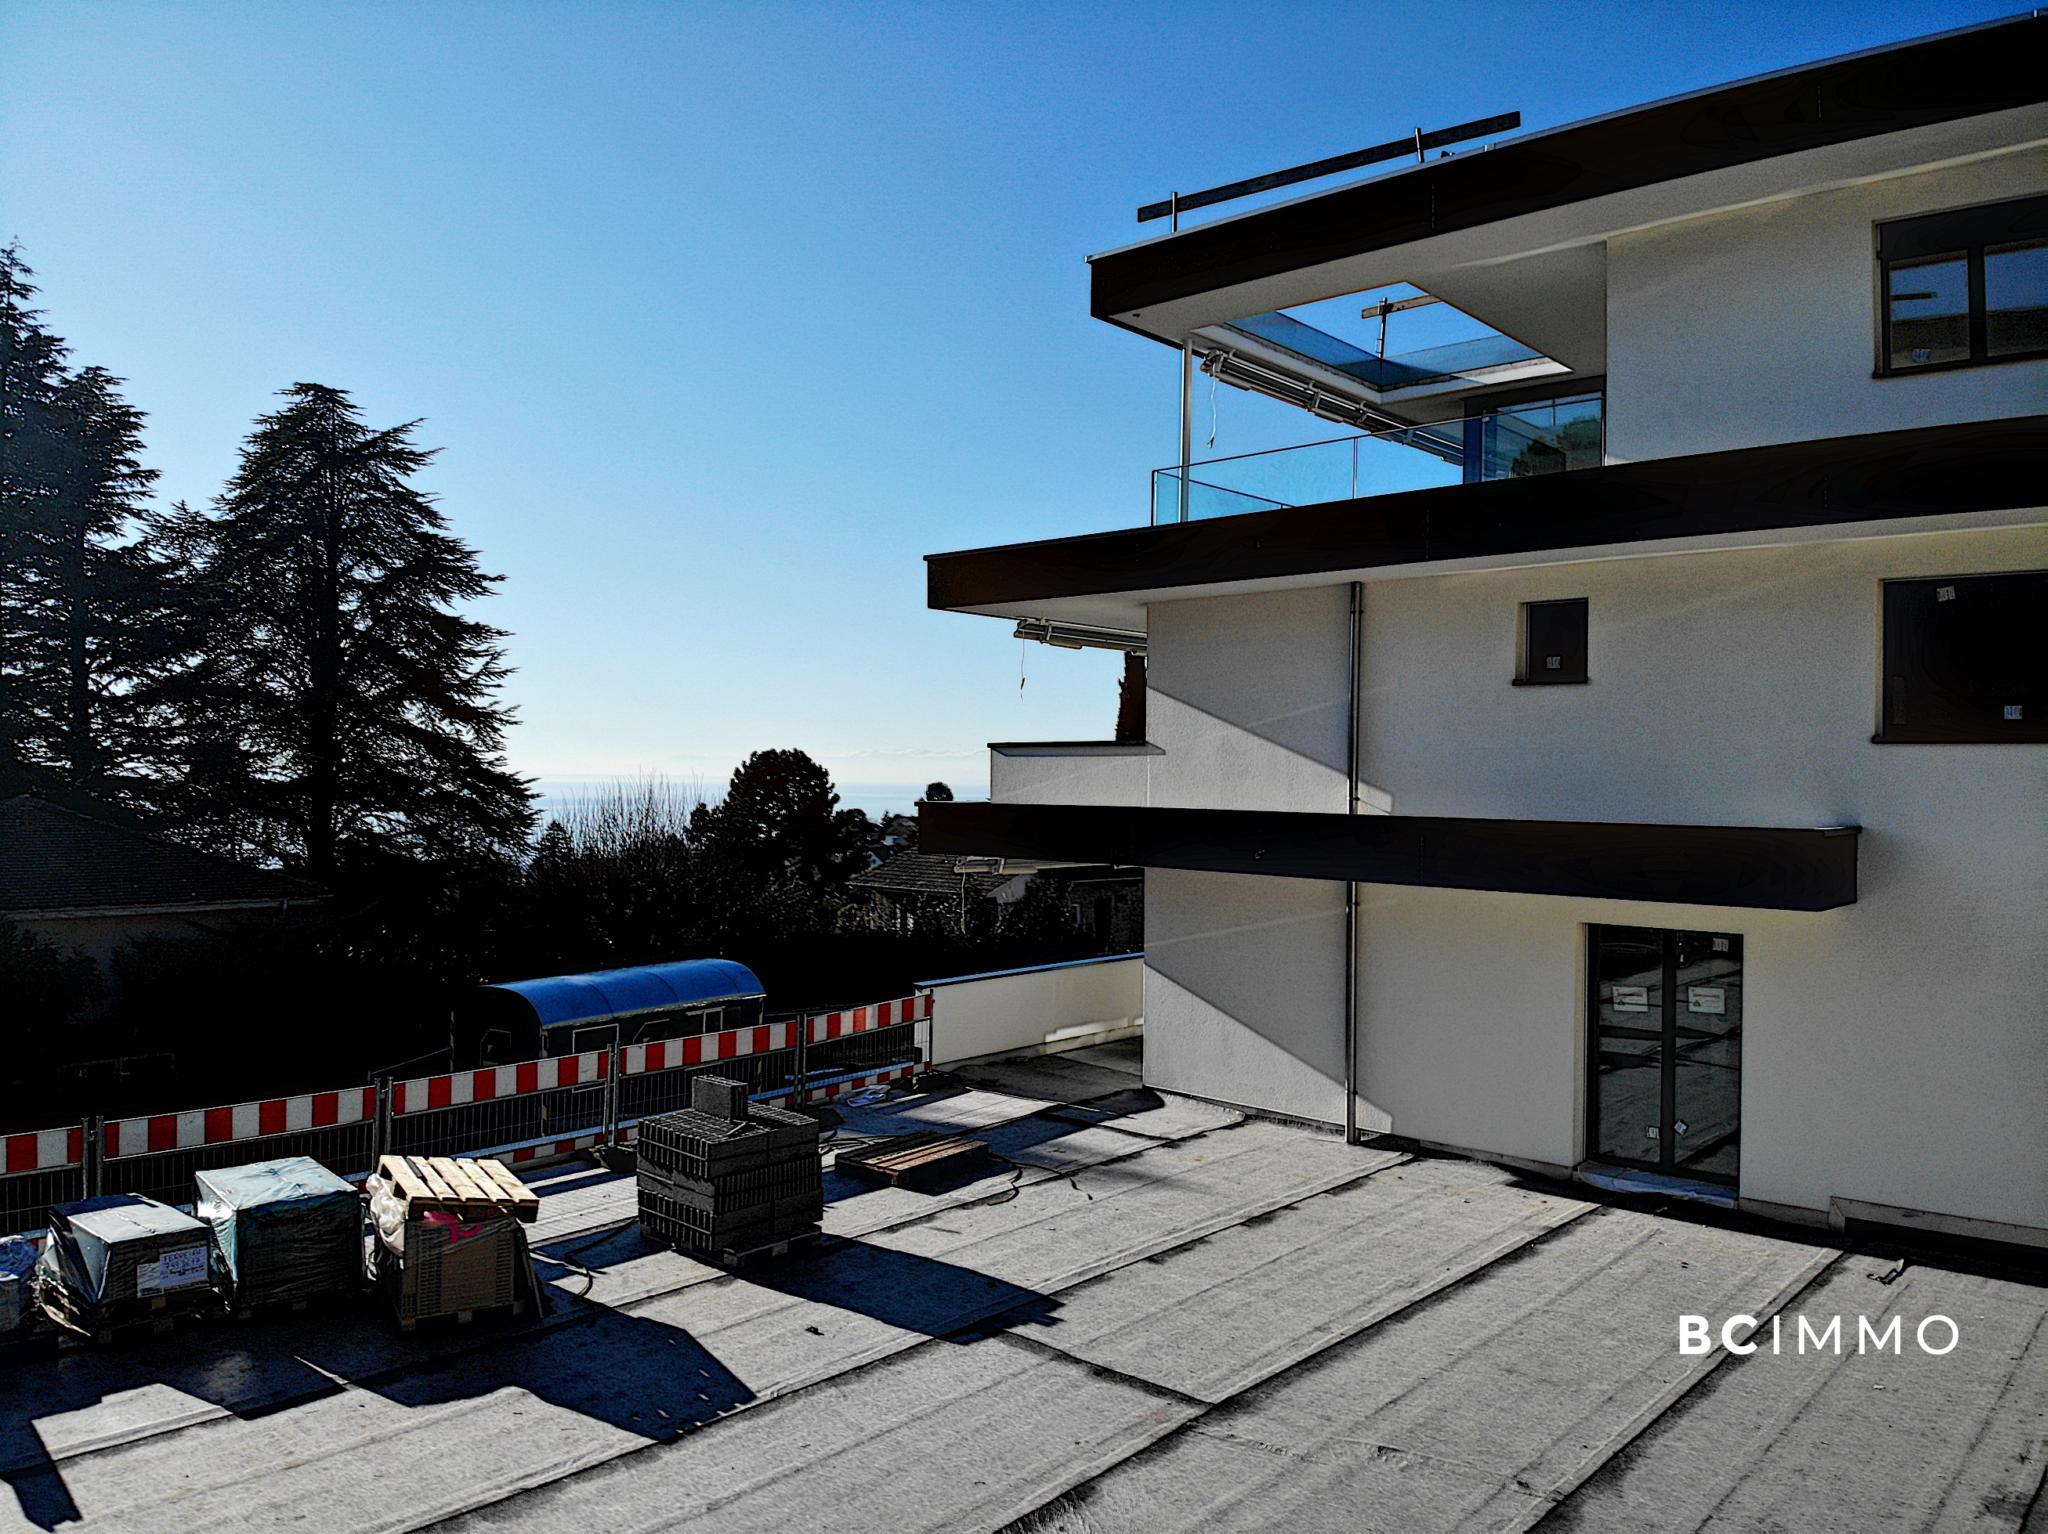 BC Immo - Magnifique appartement duplex neuf avec jardin - 1009A1VIDA